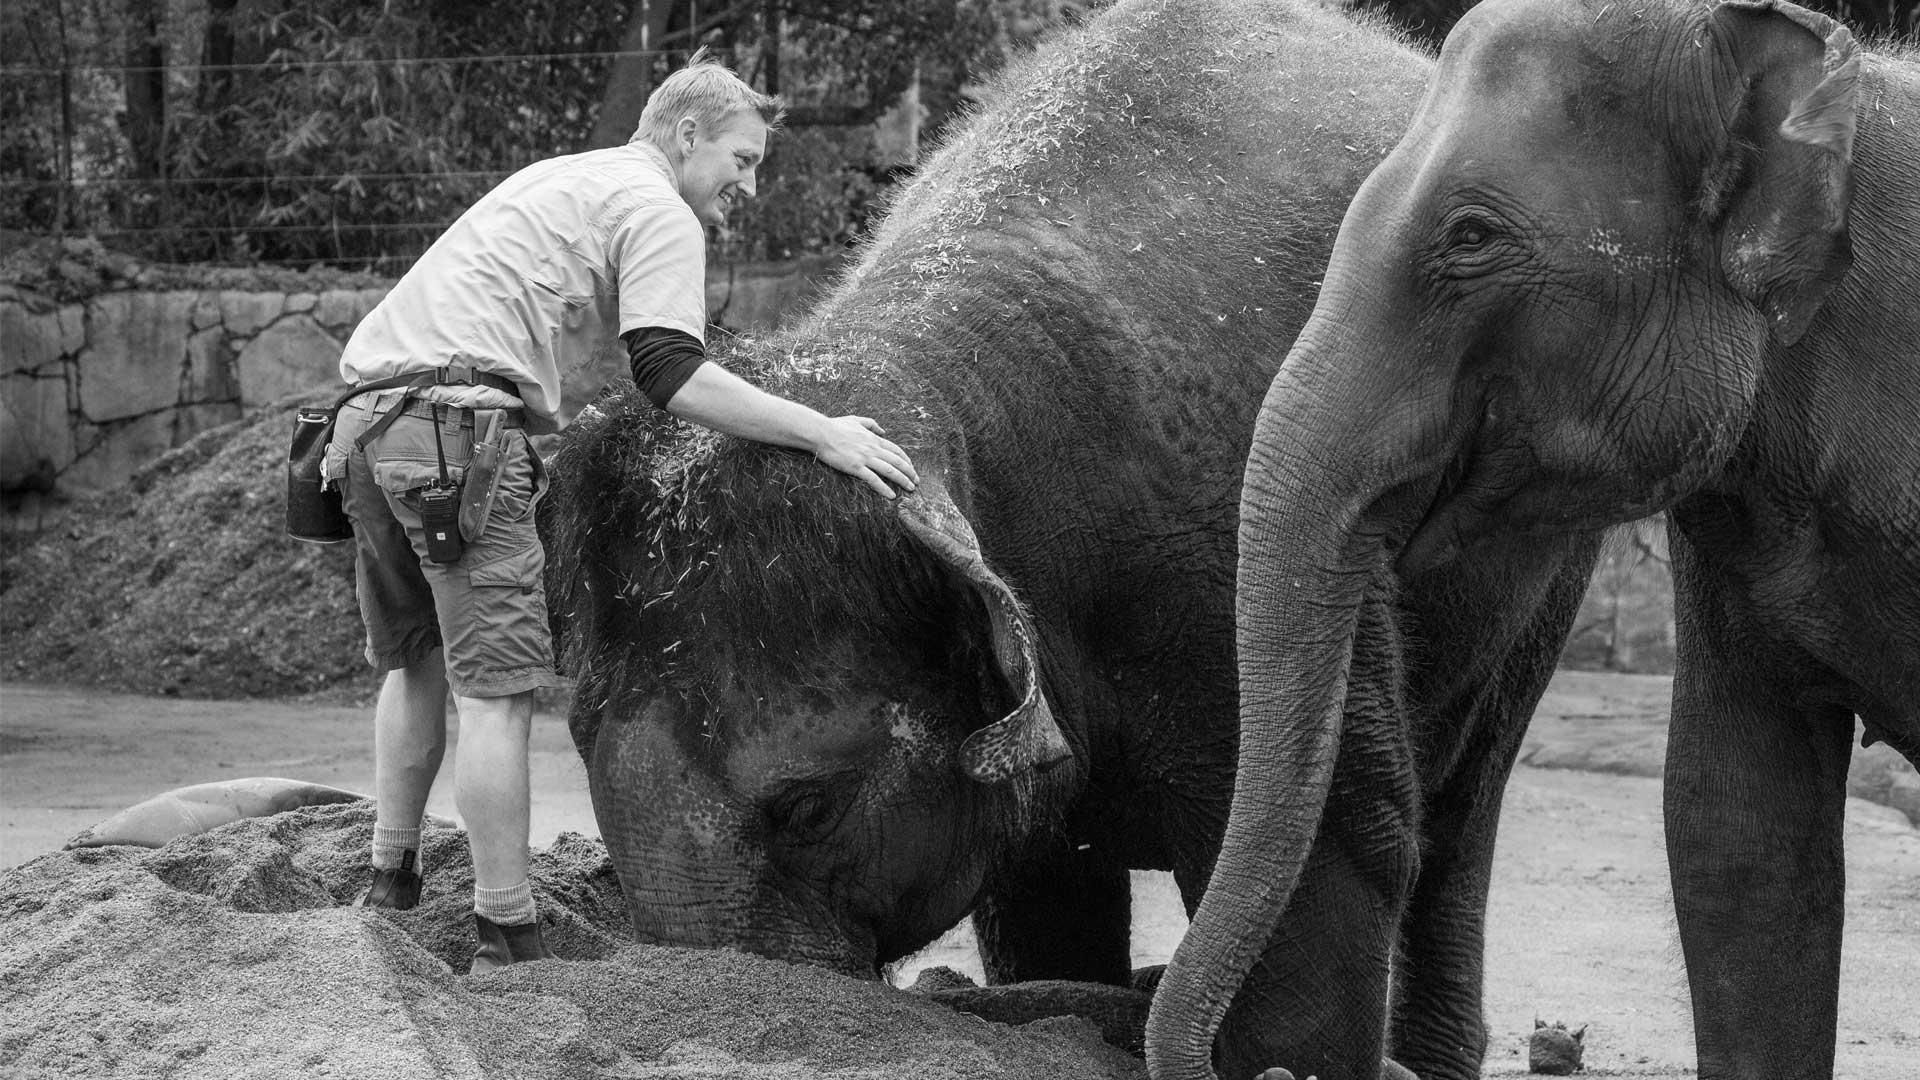 https://rfacdn.nz/zoo/assets/media/world-elephant-day-gallery-1.jpg